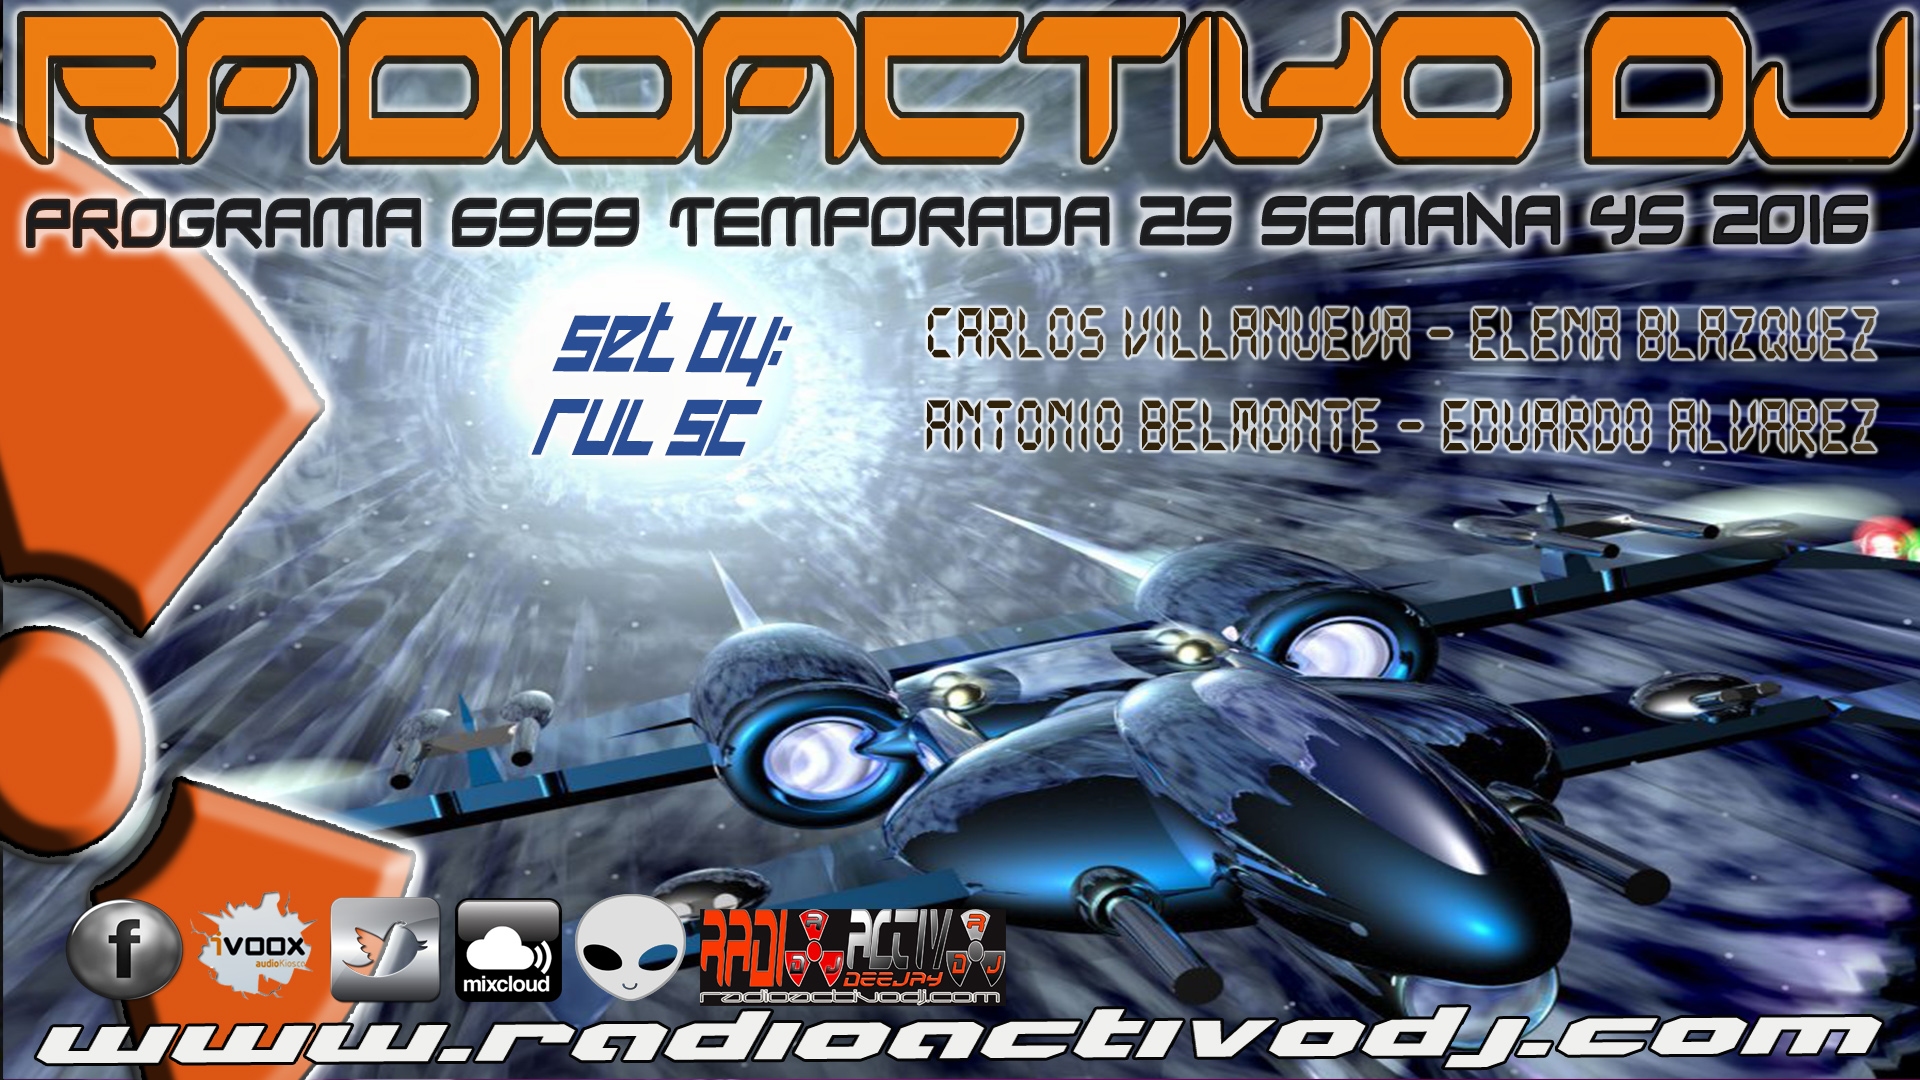 radioactivo-dj-45-2016